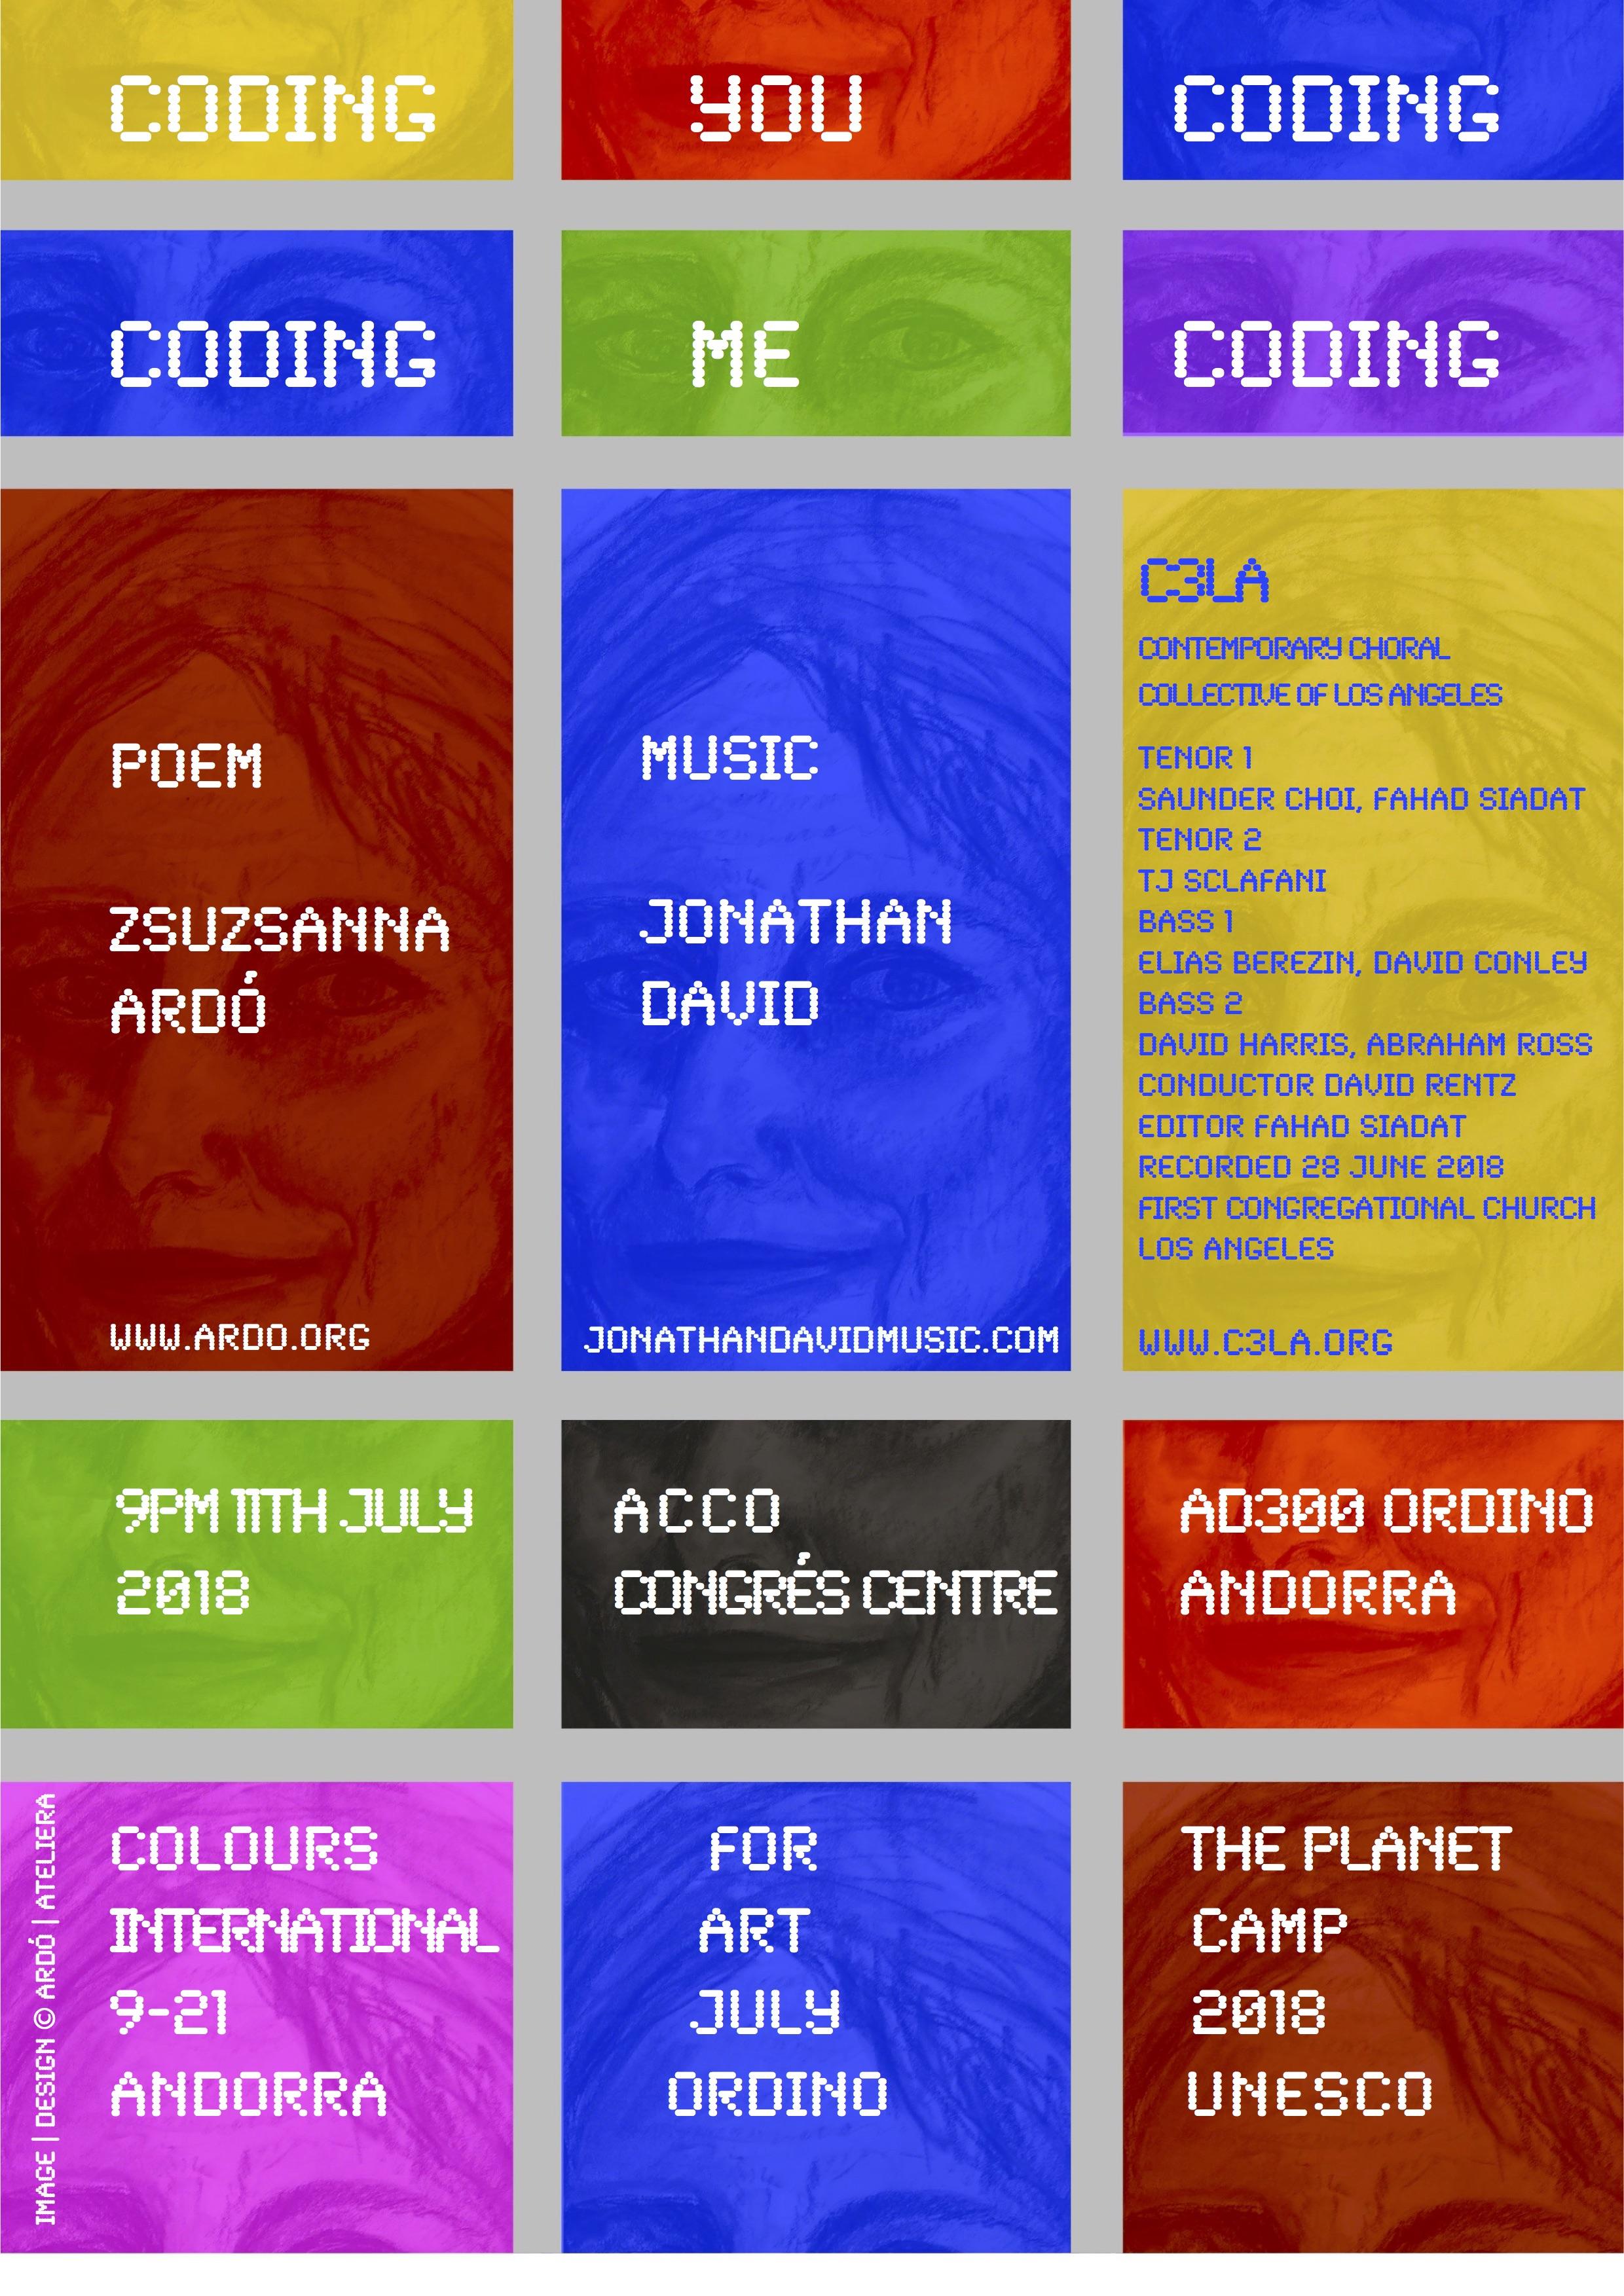 18 Andorra Unesco CYCM poster w performers v2.jpg